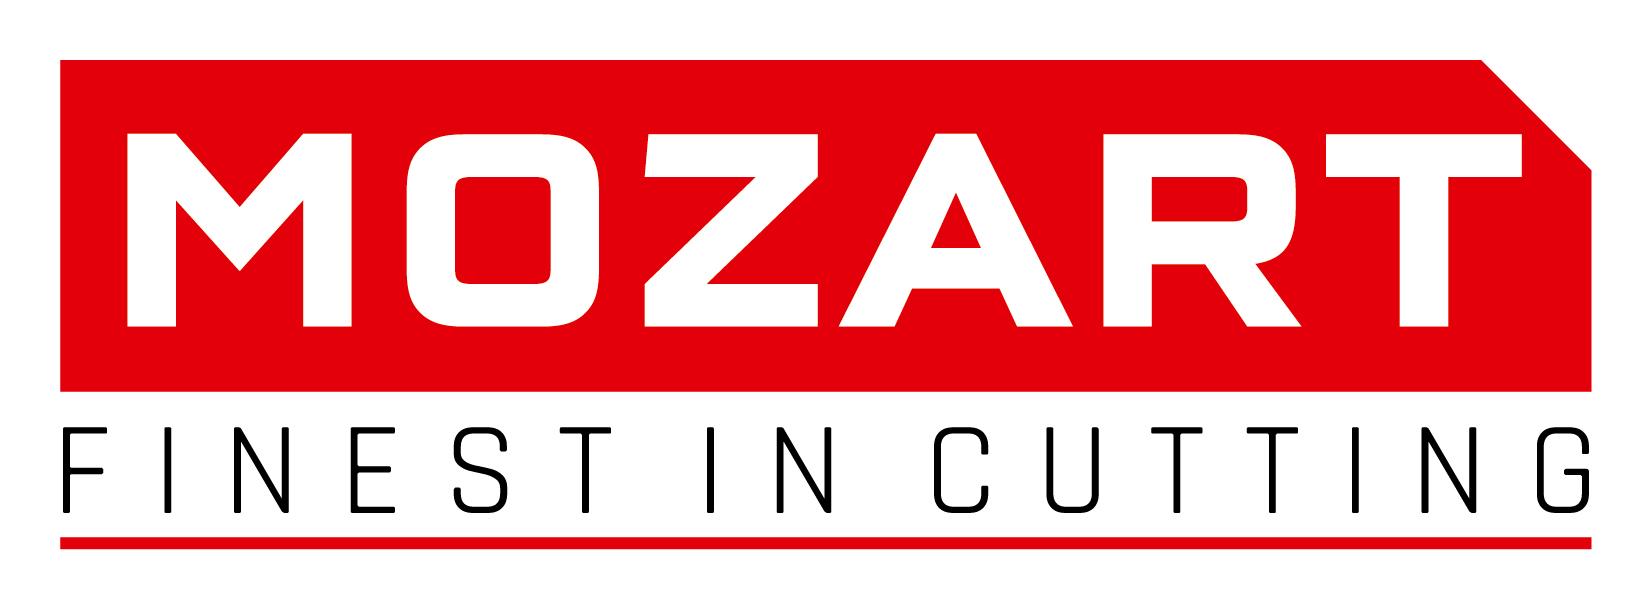 Grafcet Schulung für MOZART AG